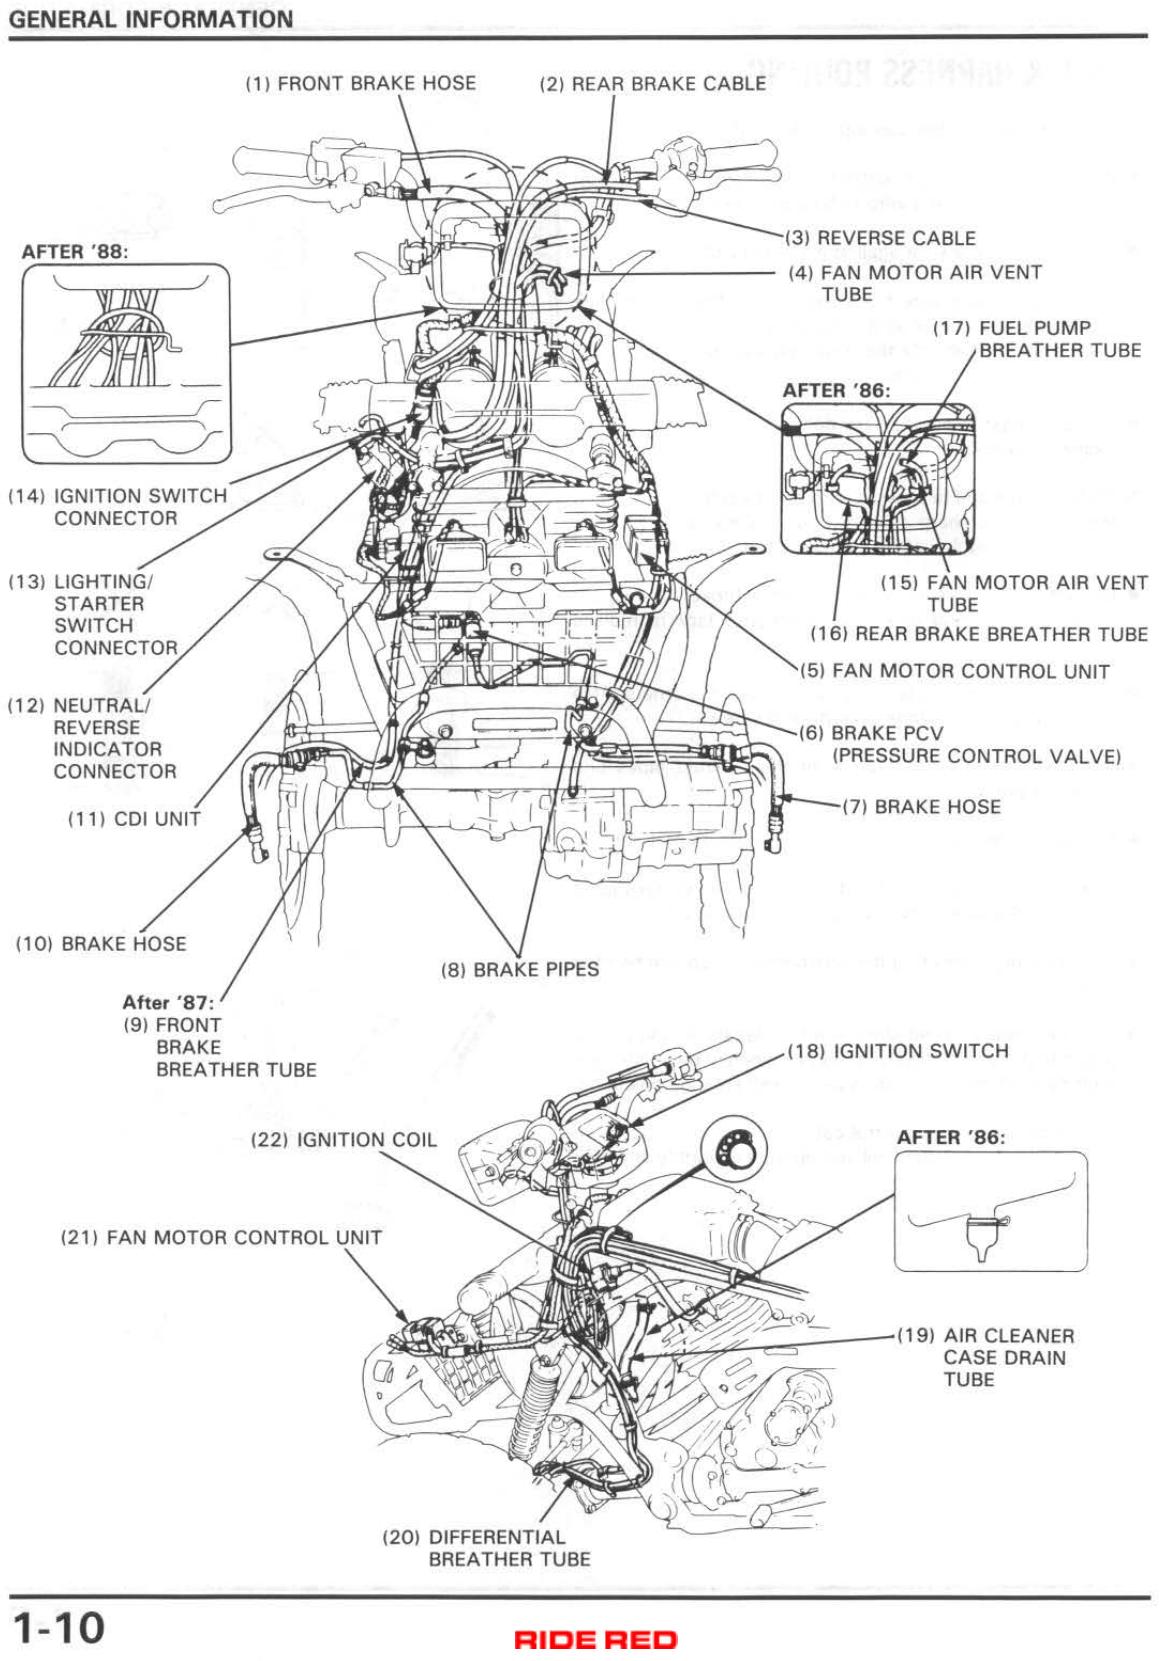 Honda Rancher Headlight | Wiring Diagram Database on banshee headlight assembly, banshee wiring diagram, banshee coil wiring, banshee lights wiring, banshee headlight brackets, banshee battery wiring, banshee headlight mounts, banshee headlight components,